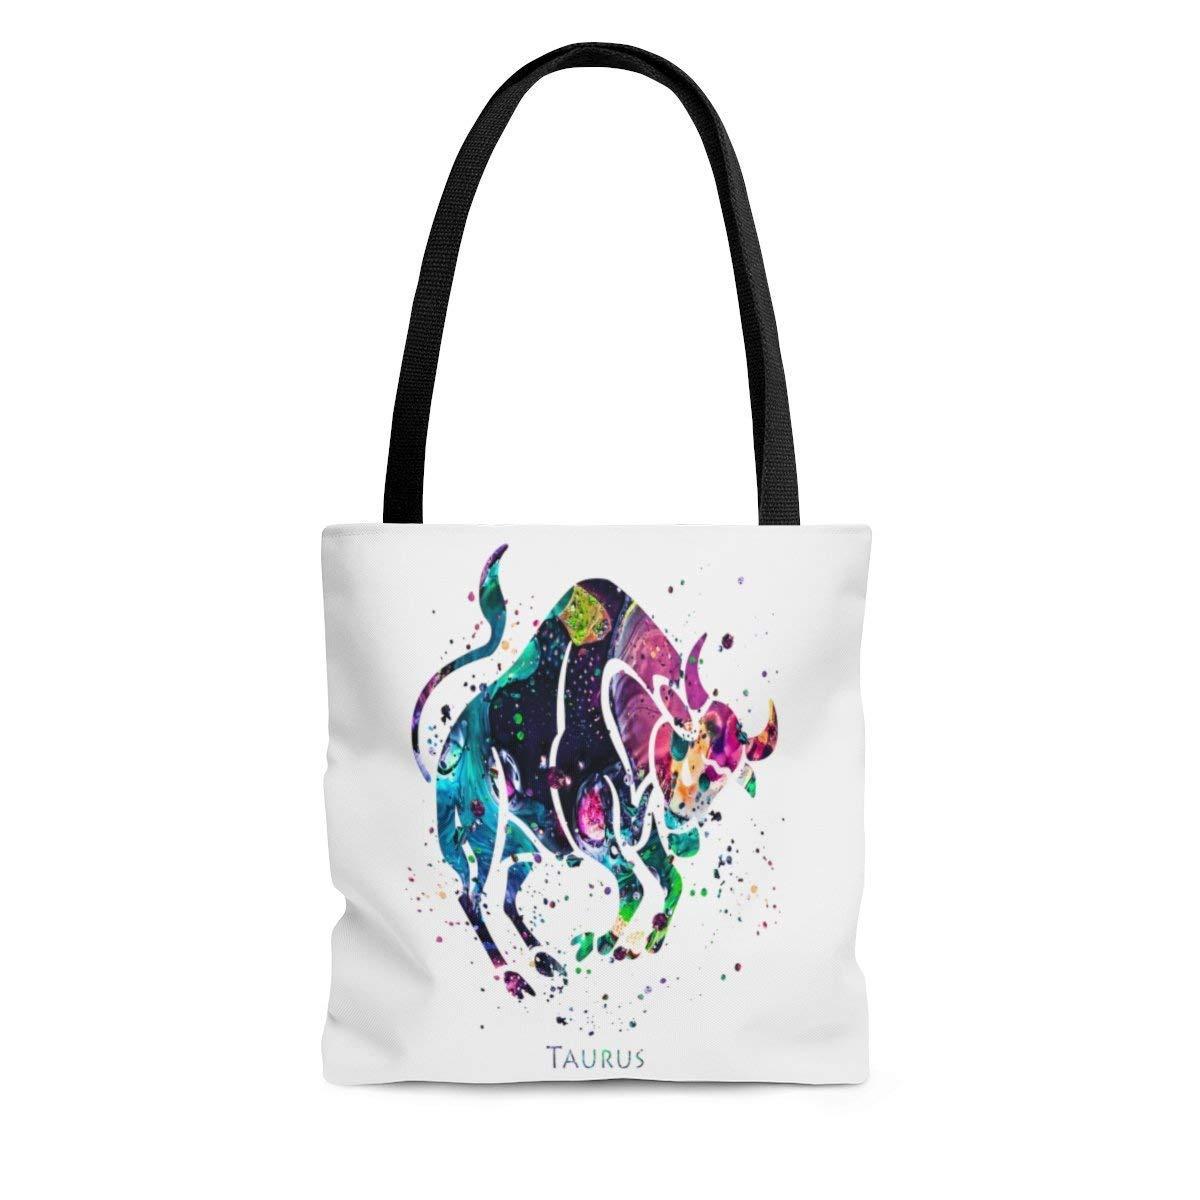 Taurus Zodiac Sign Max 79% OFF Tote Beach Books Bombing new work Bag